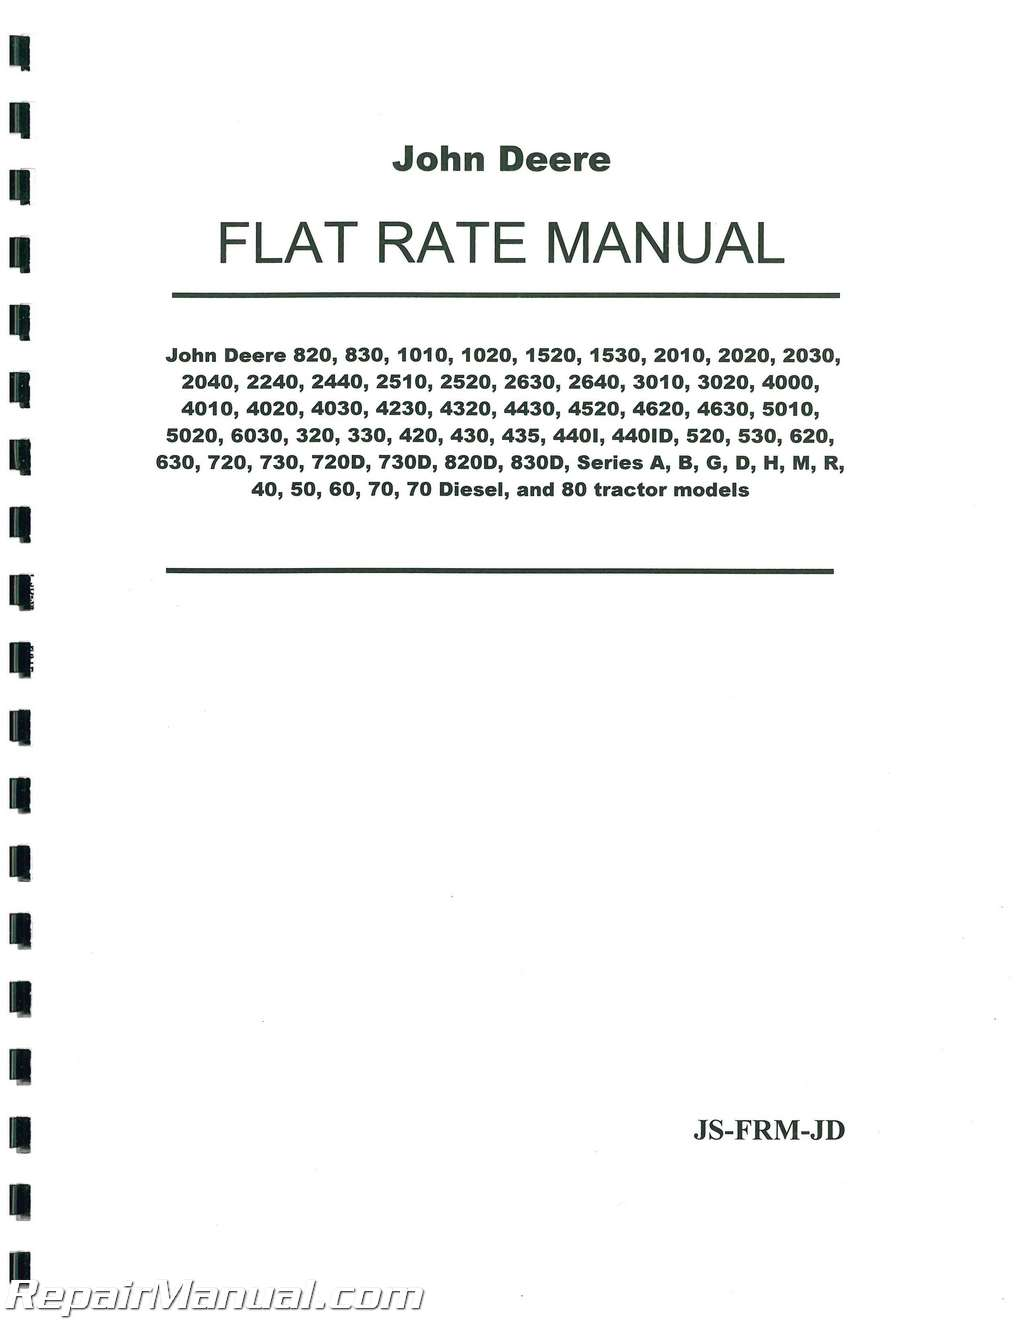 John Deere Tractor Flat Rate Manual 4320 Wiring Schematic